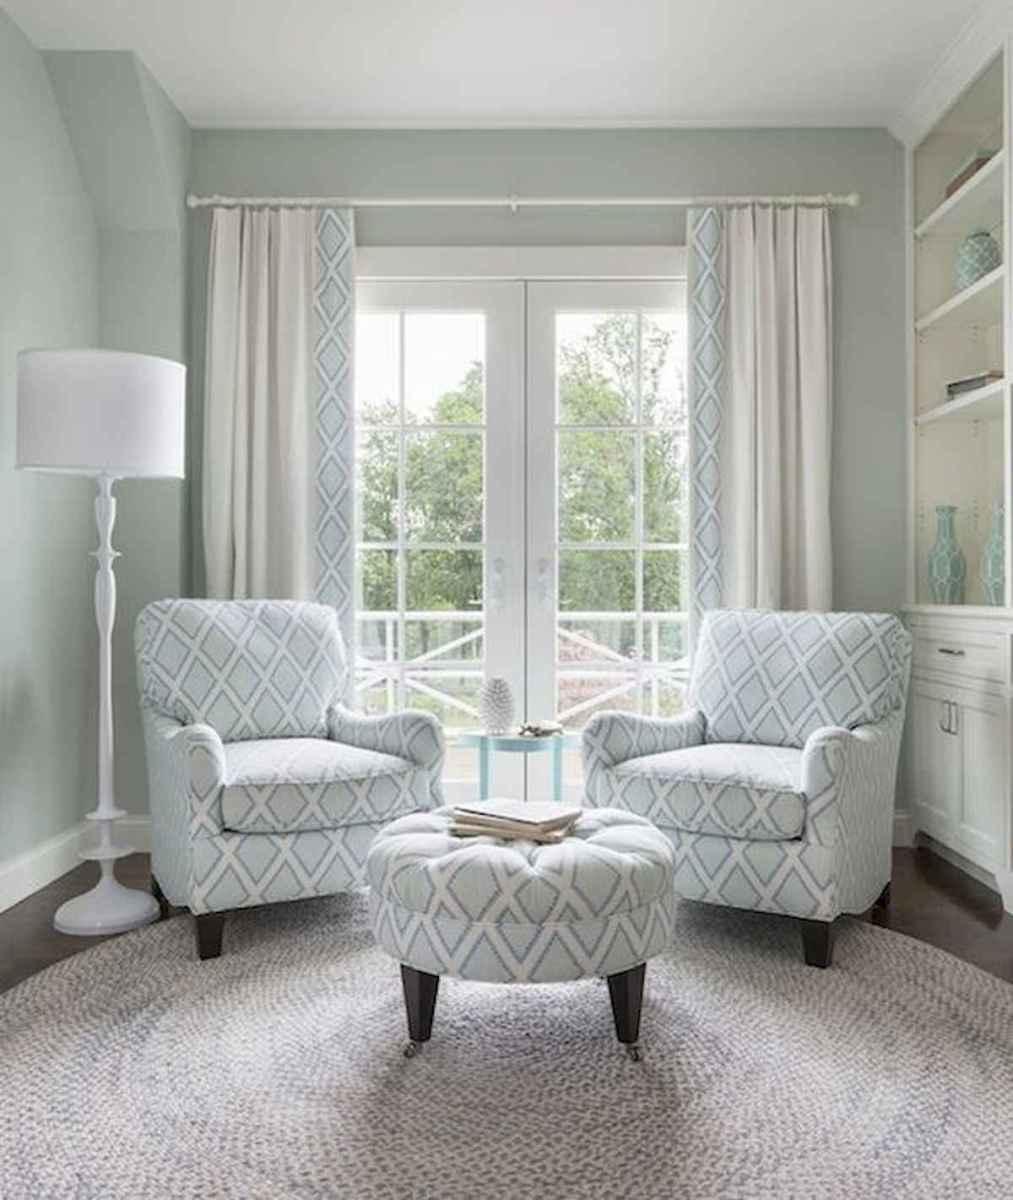 80 Elegant Furniture For Modern Farmhouse Living Room Decor Ideas (27)